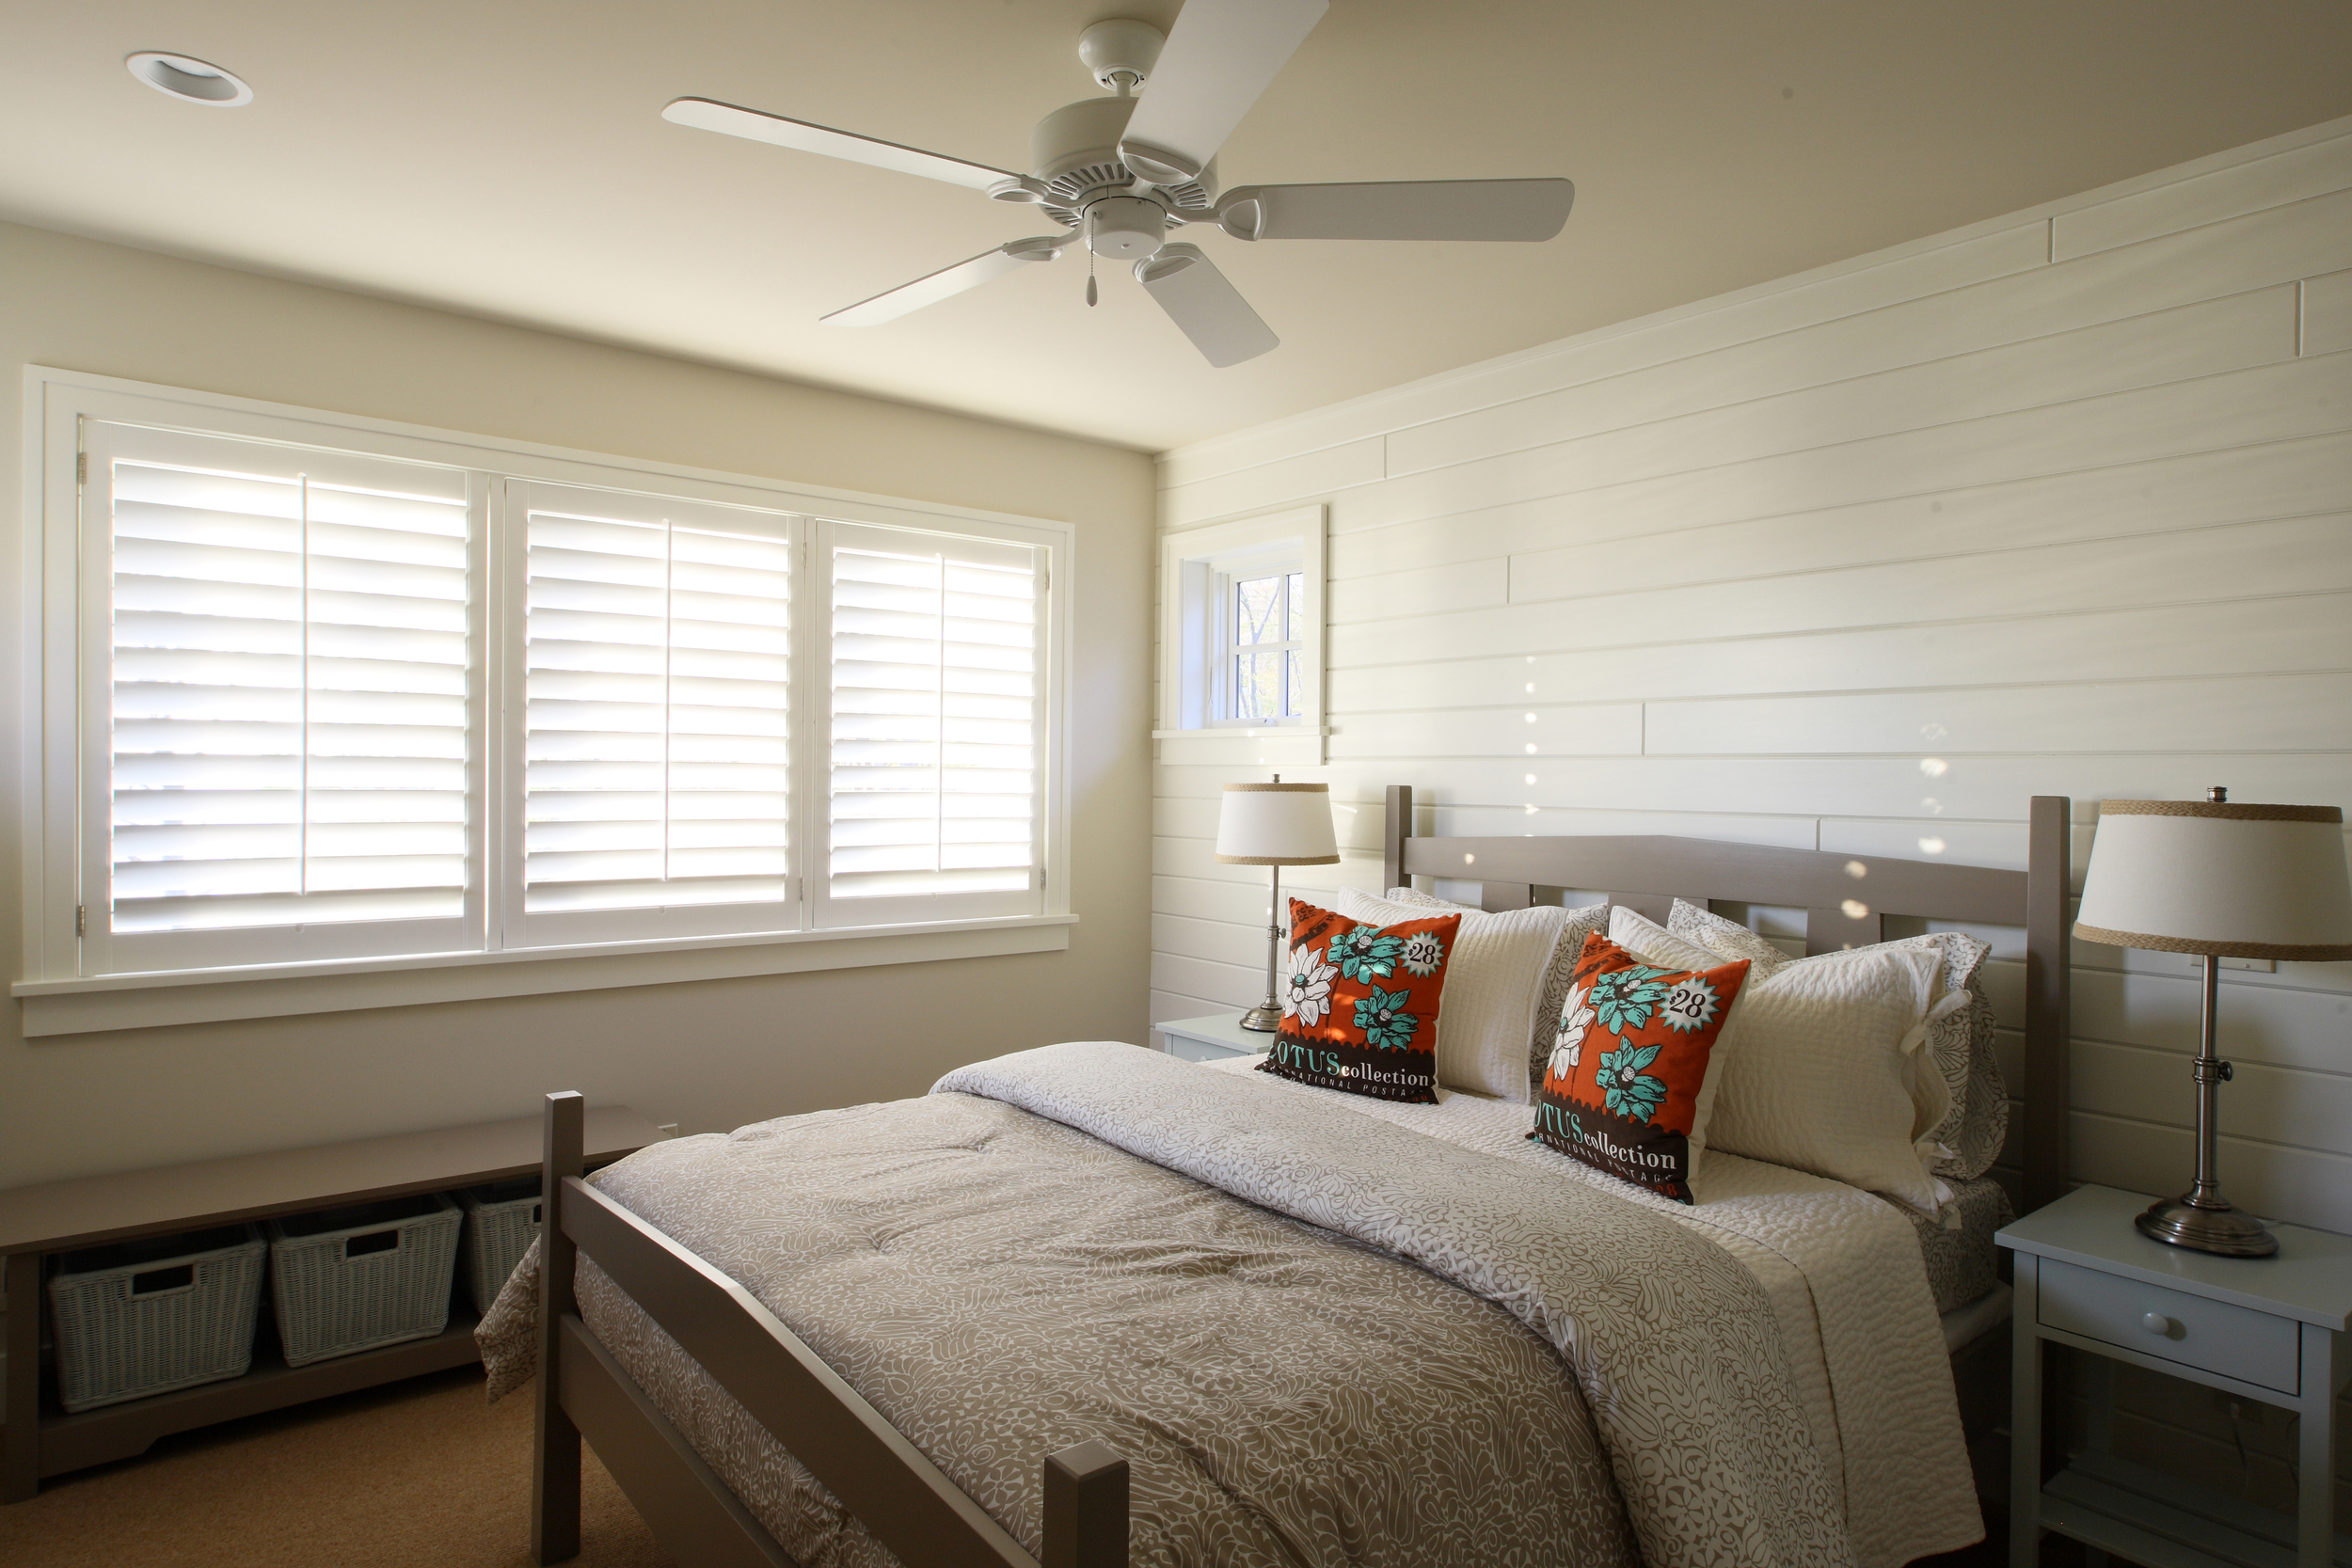 Design Home 1112.jpg